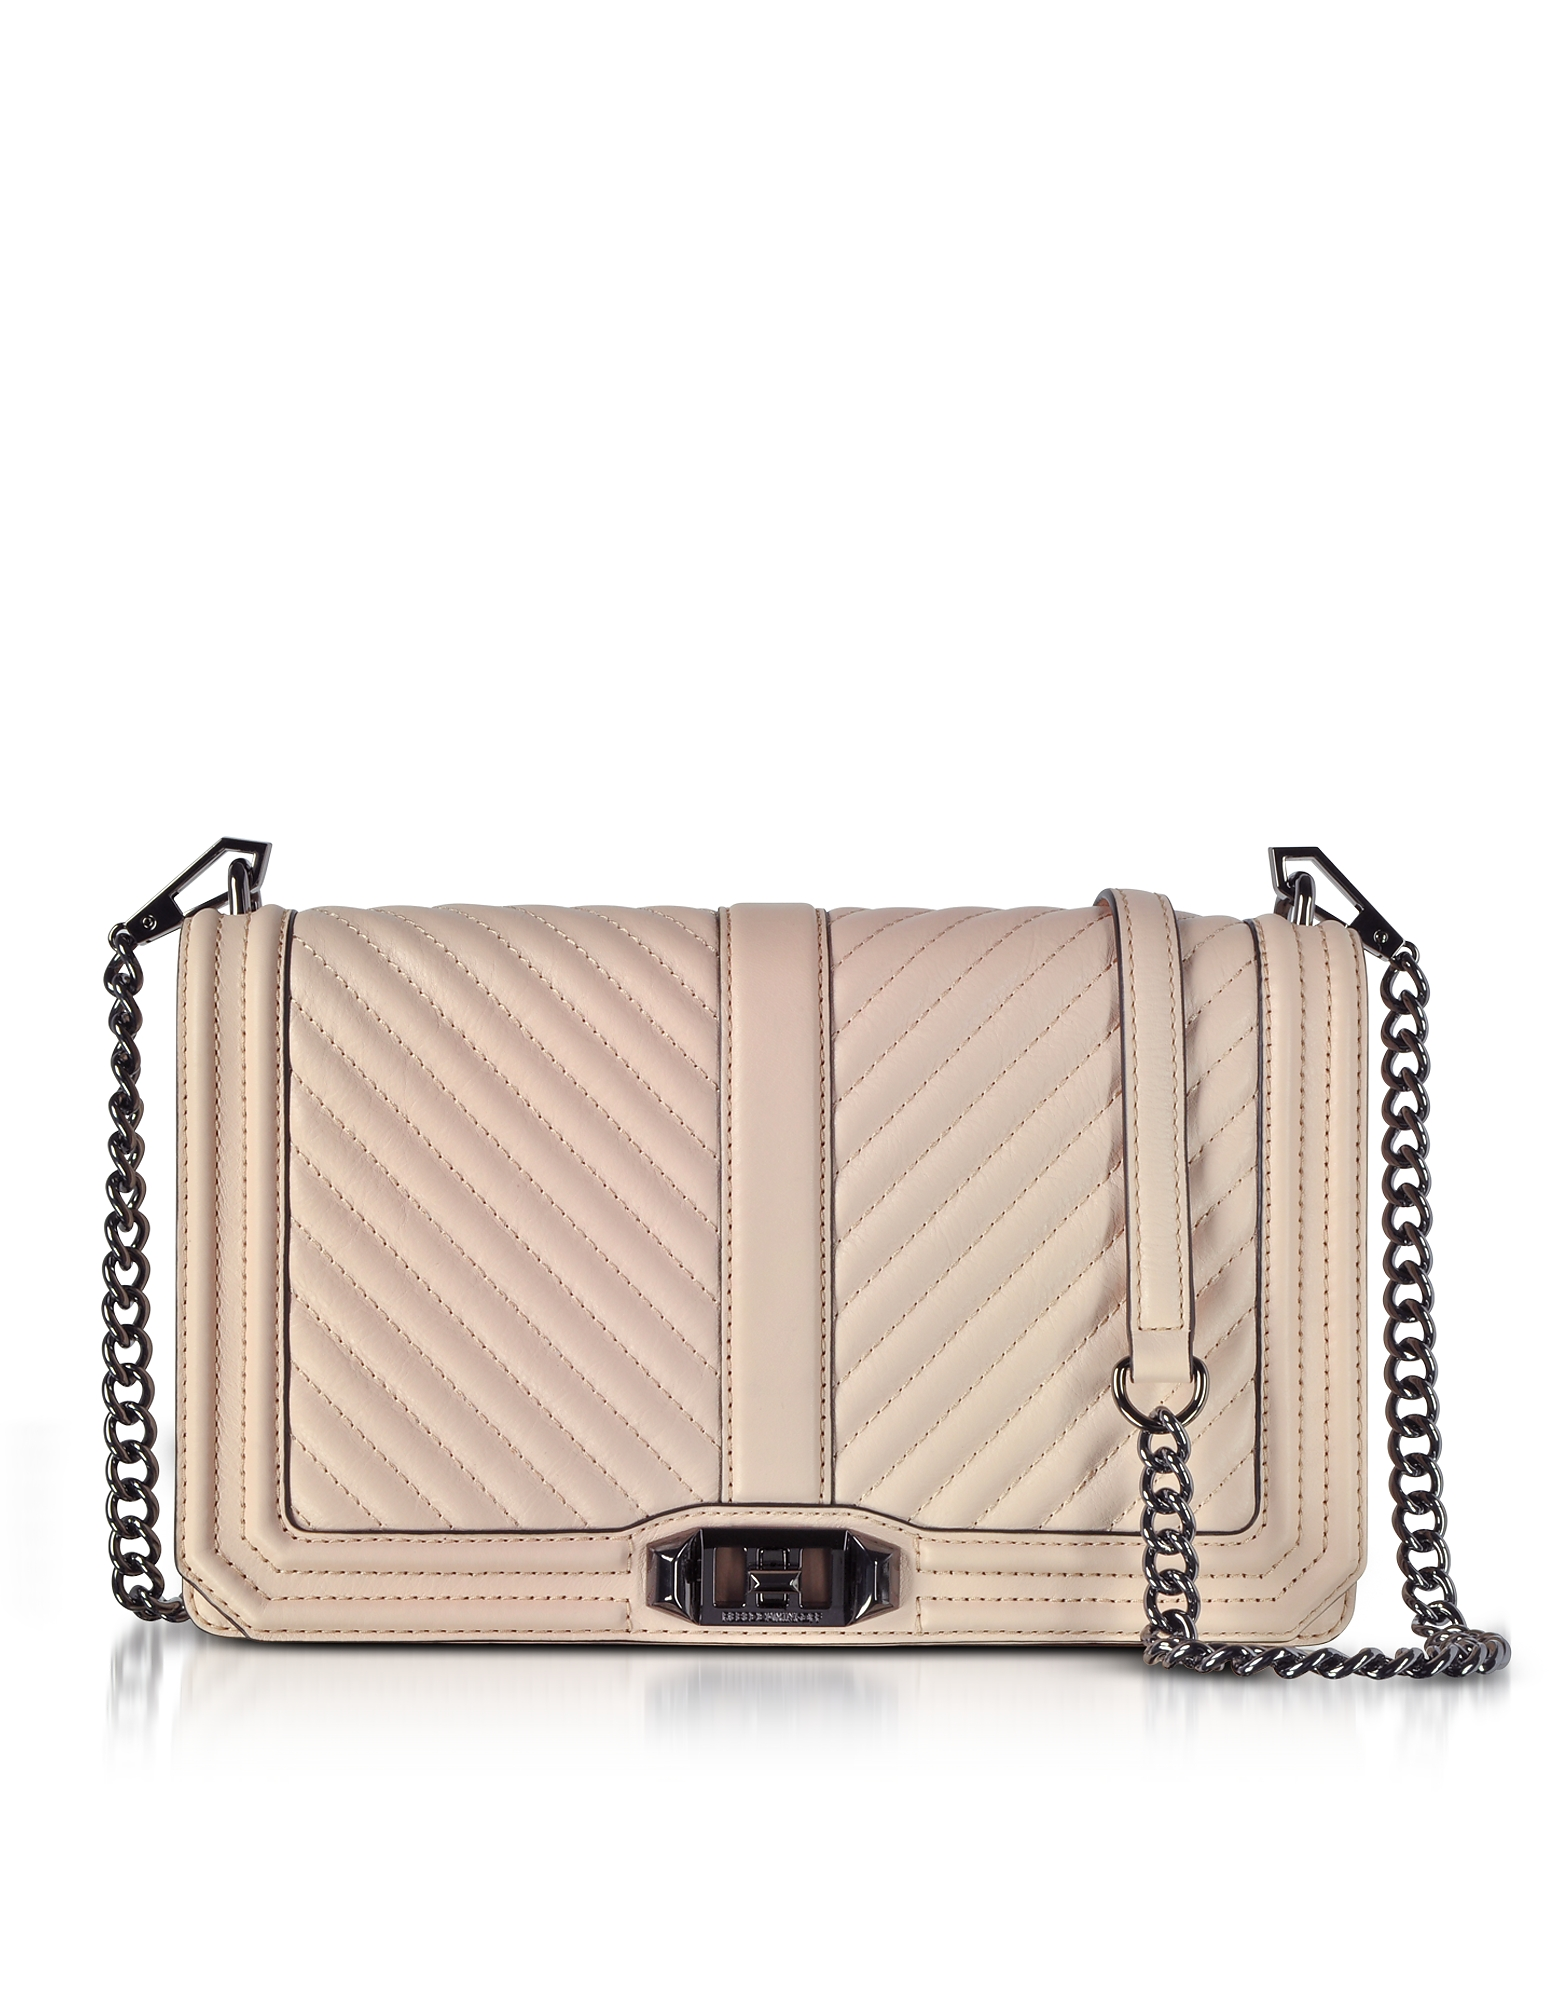 Rebecca Minkoff Handbags, Nude Chevron Quilted Leather Slim Love Crossbody Bag